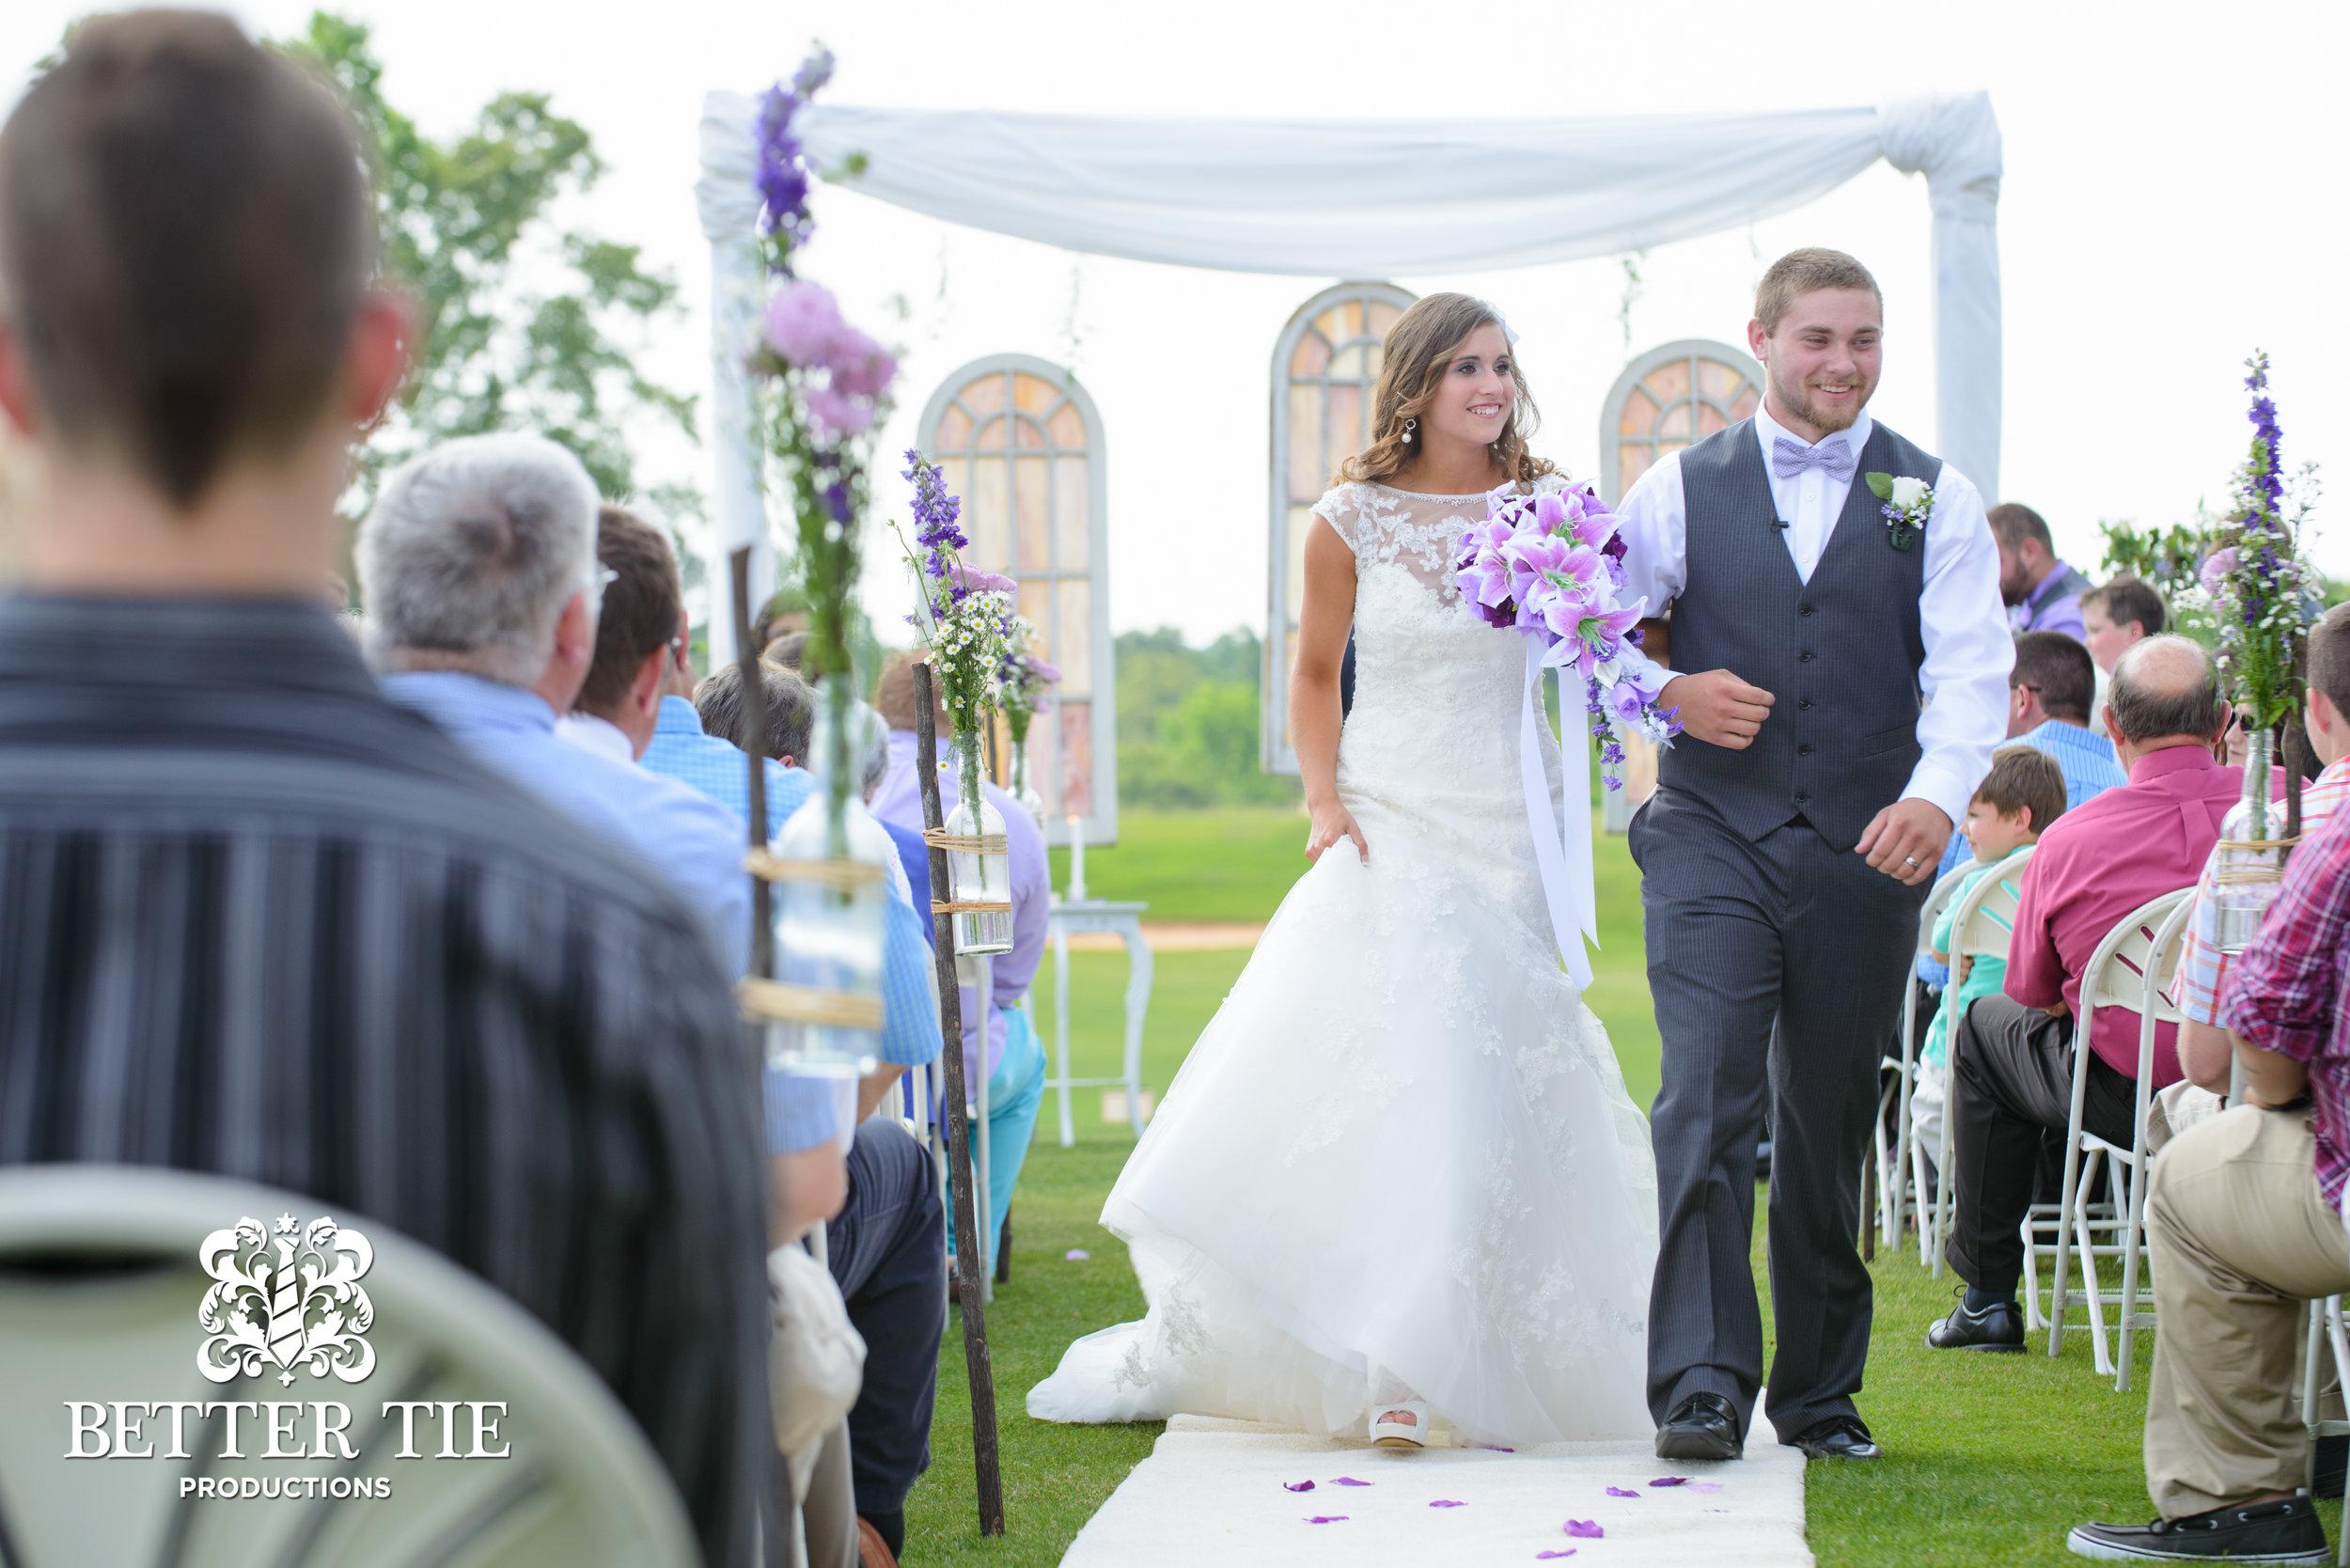 cateechee-golf-club-wedding-10.jpg